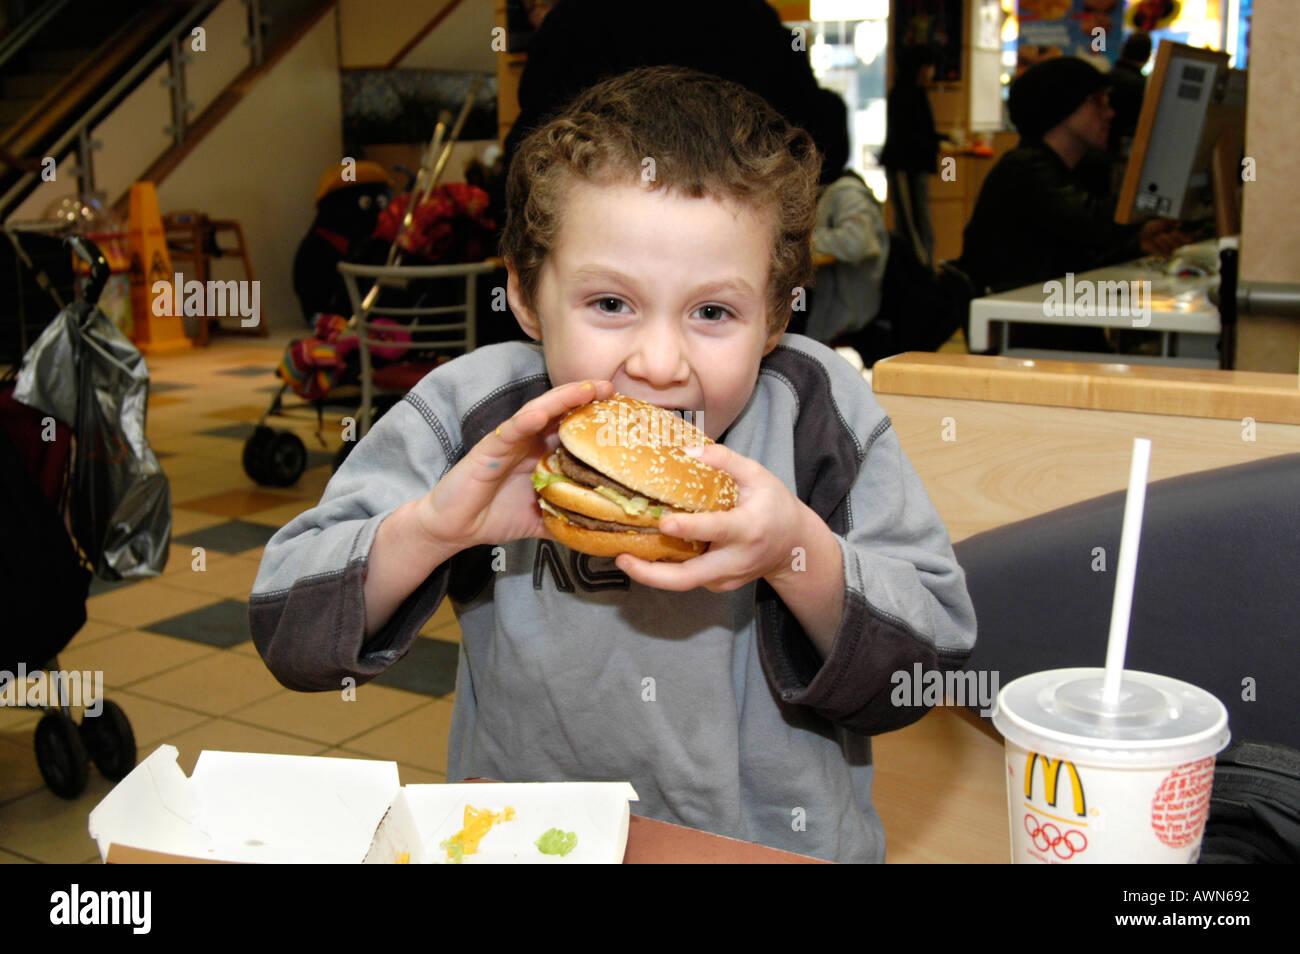 Small boy eating Mcdonald's Big Mac, England UK - Stock Image